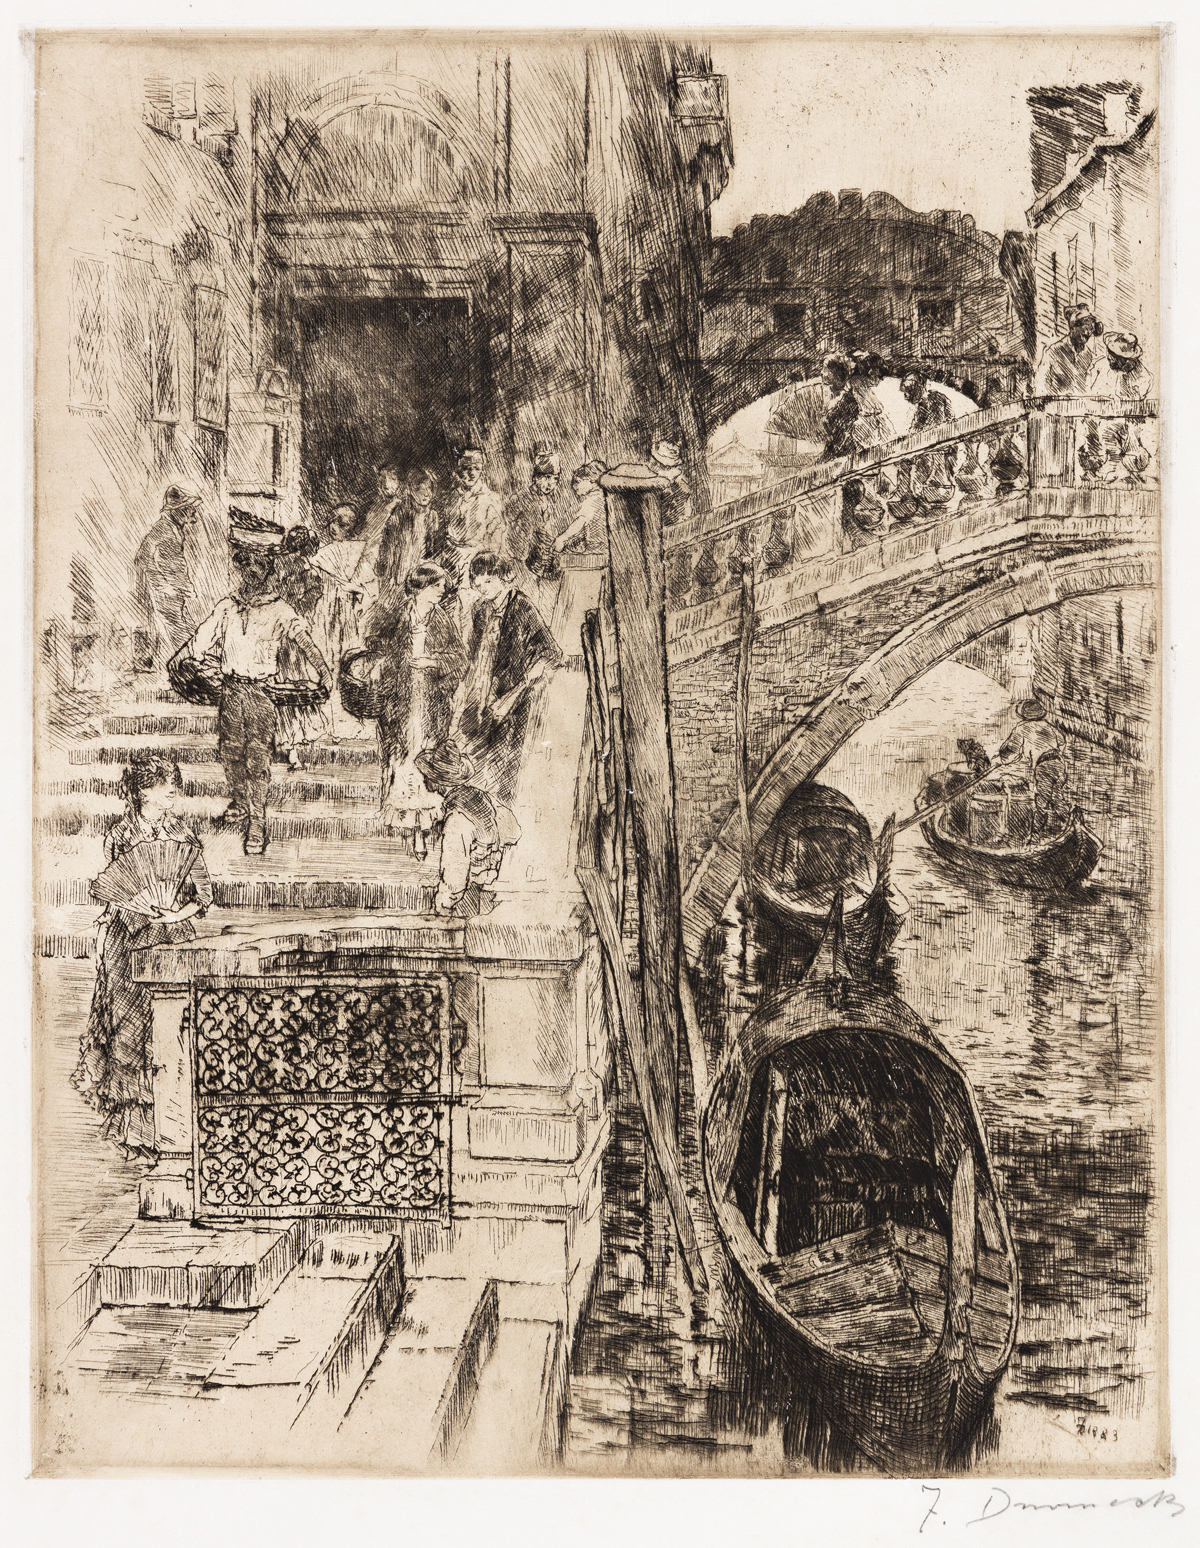 FRANK DUVENECK The Bridge of Sighs, Venice (First Plate).